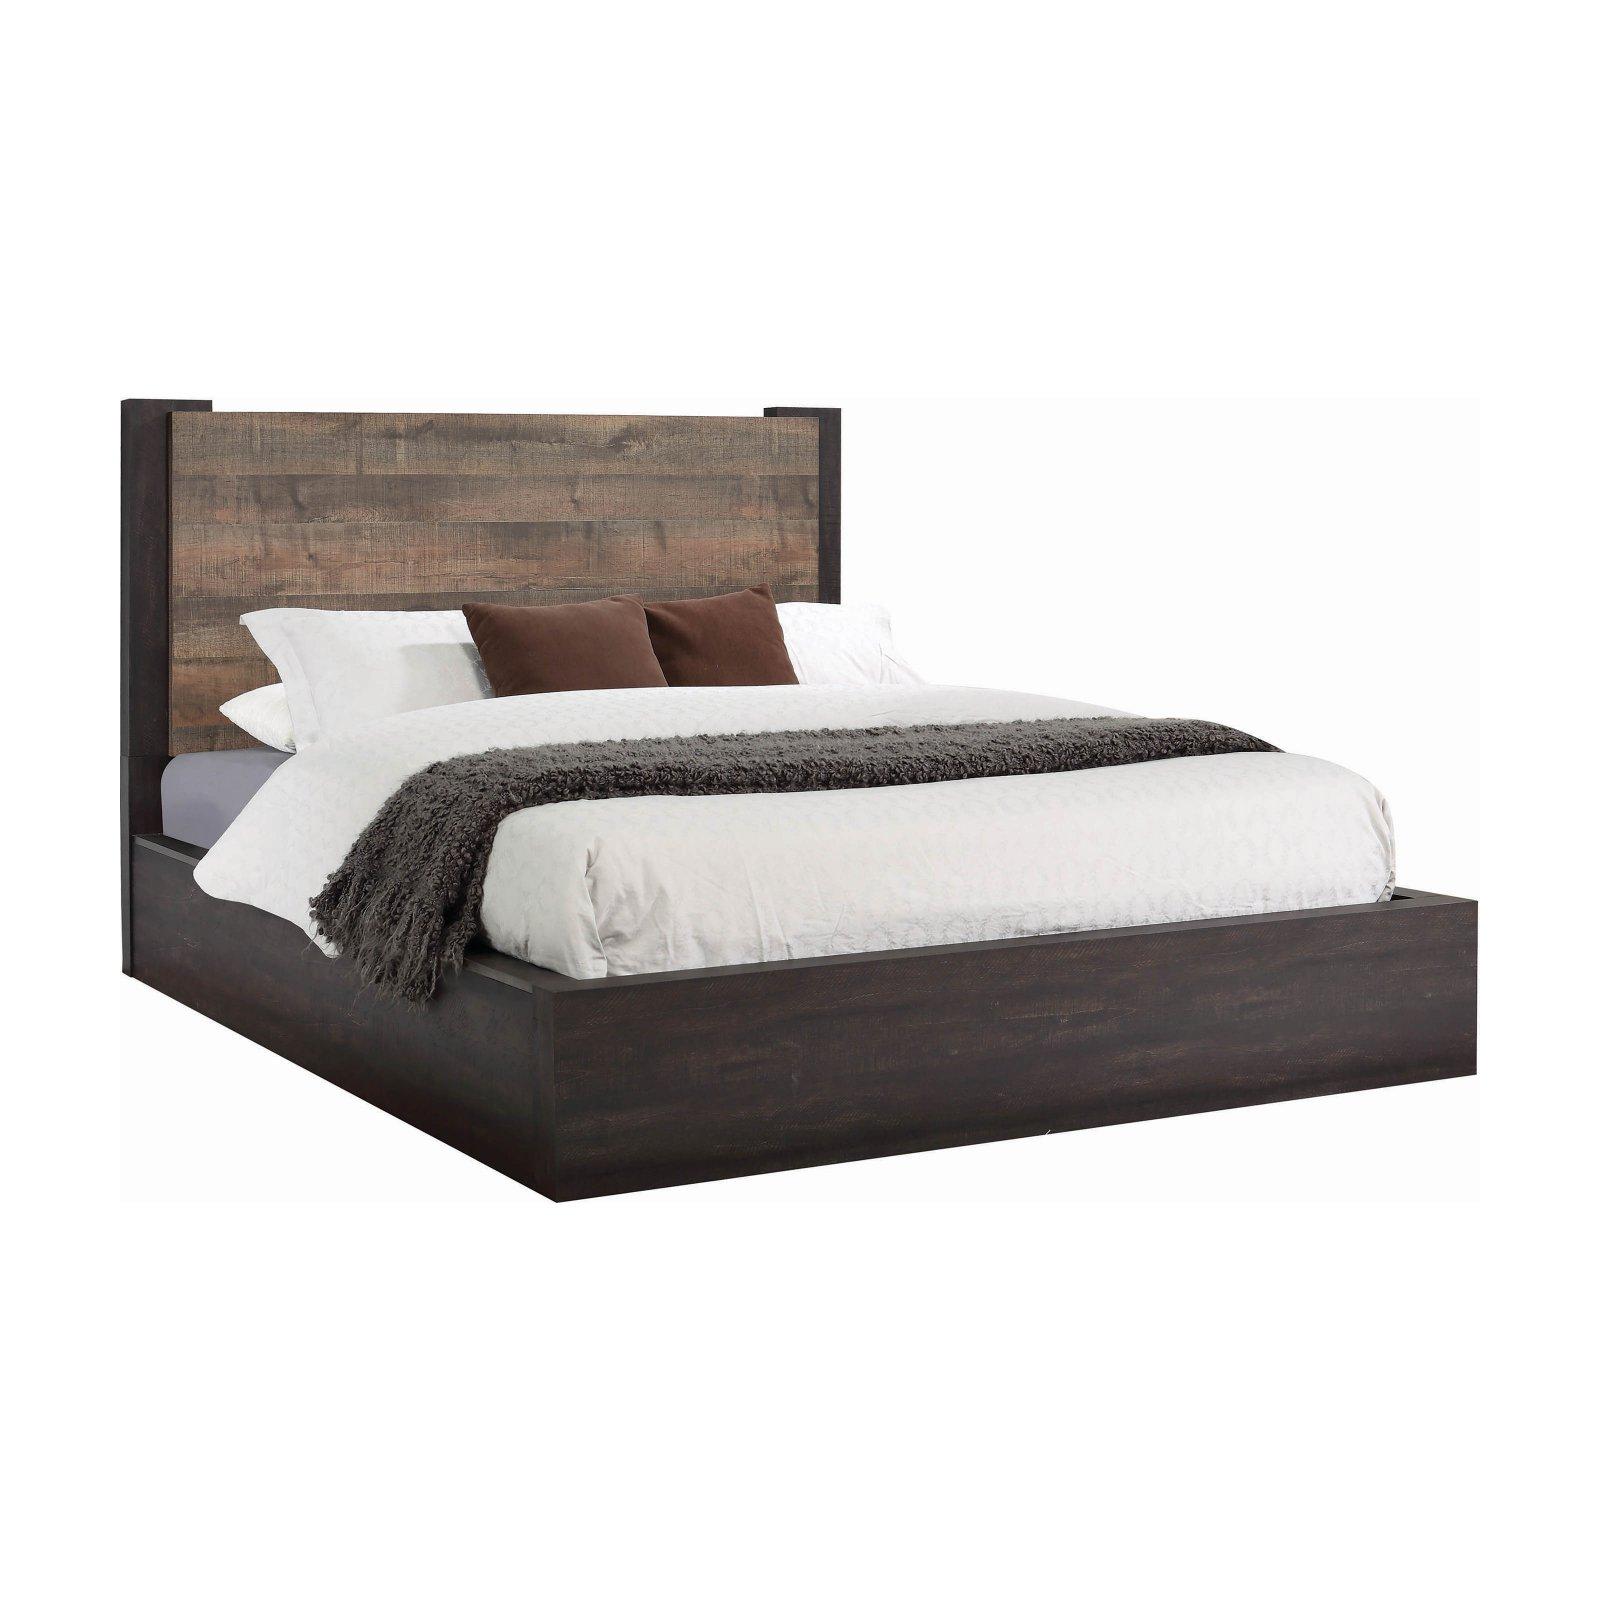 Coaster Furniture Weston Platform Bed, Size King Queen